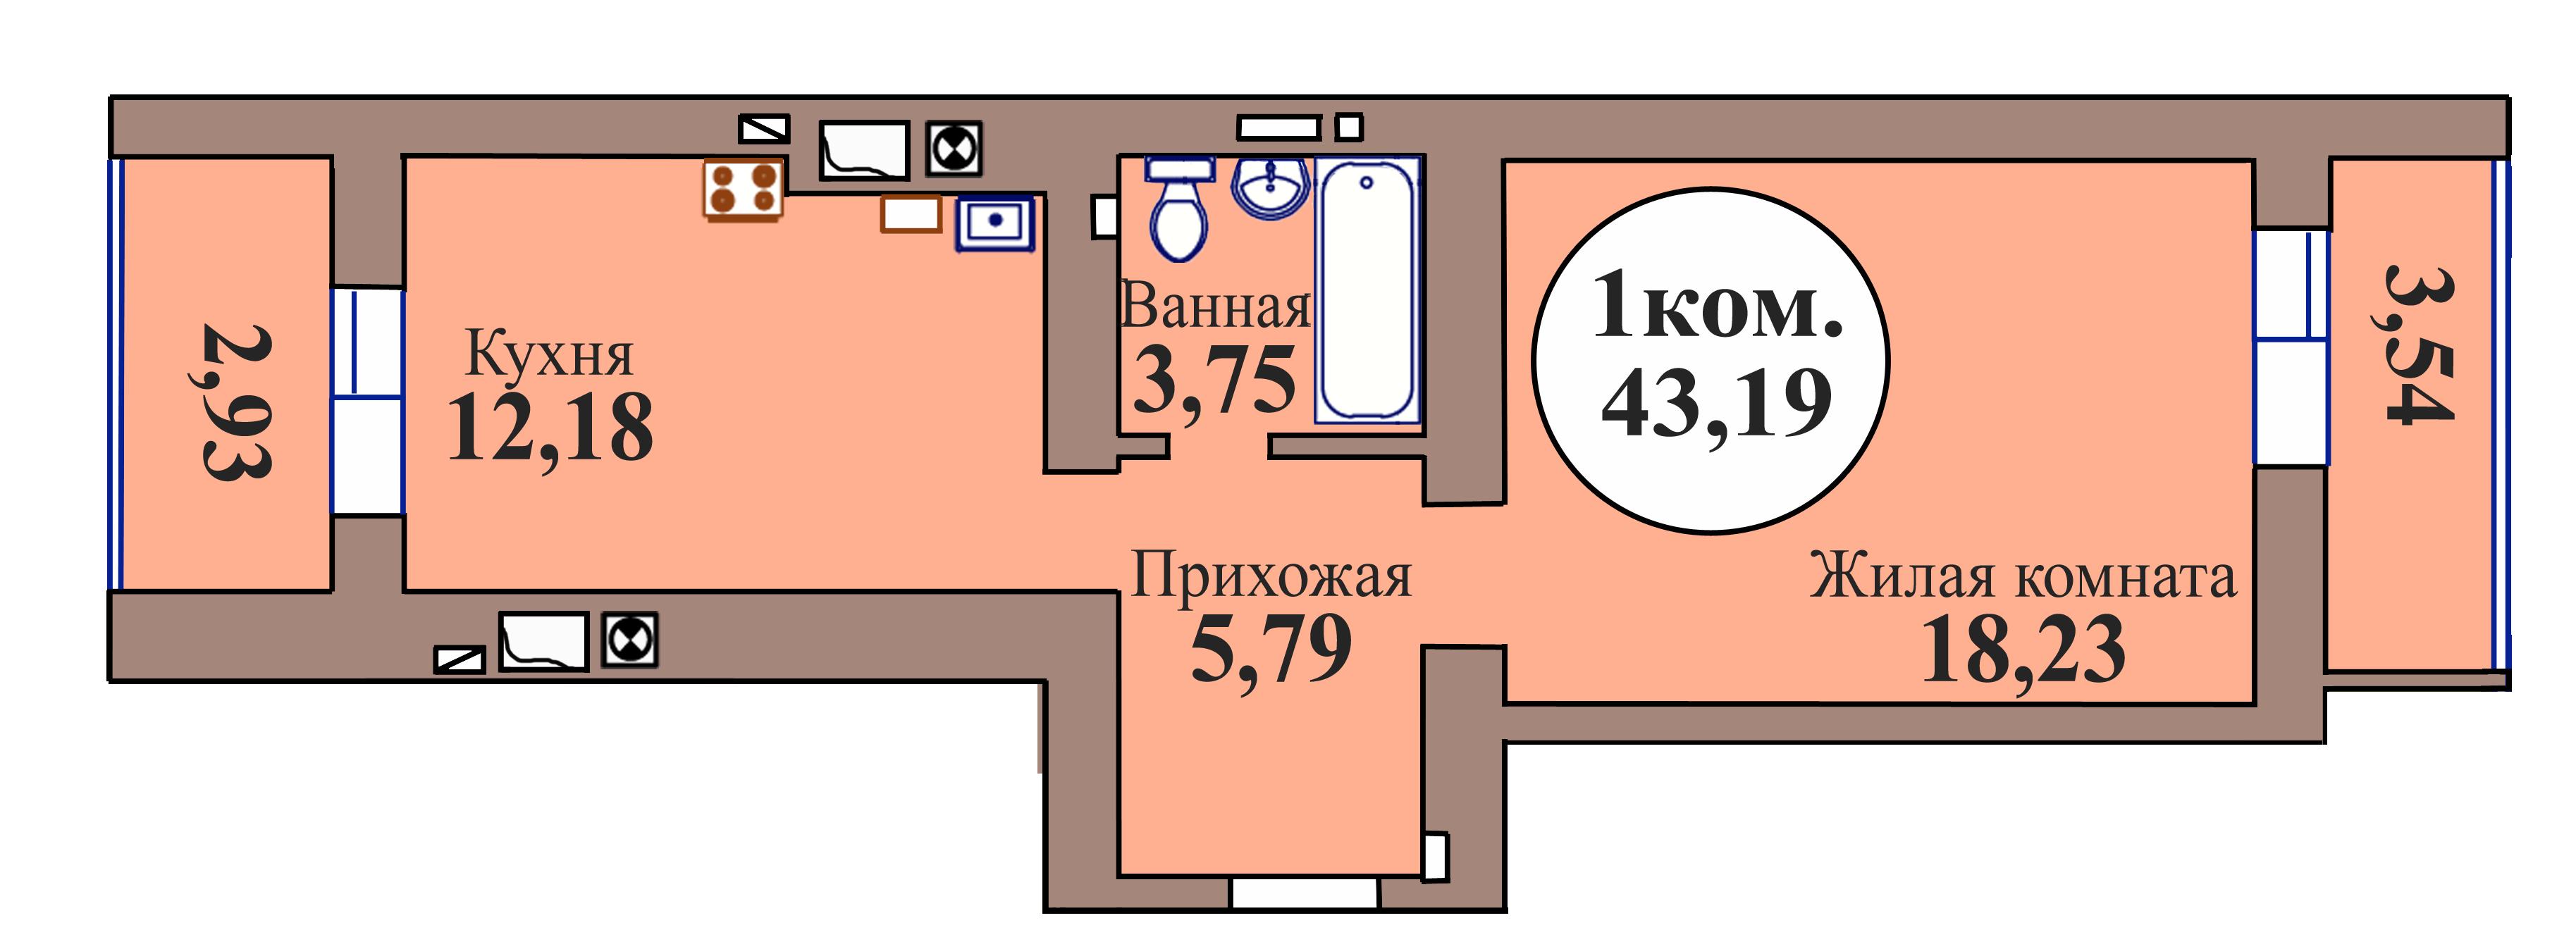 1-комн. кв. по пер. Калининградский, 5 кв. 95 в Калининграде